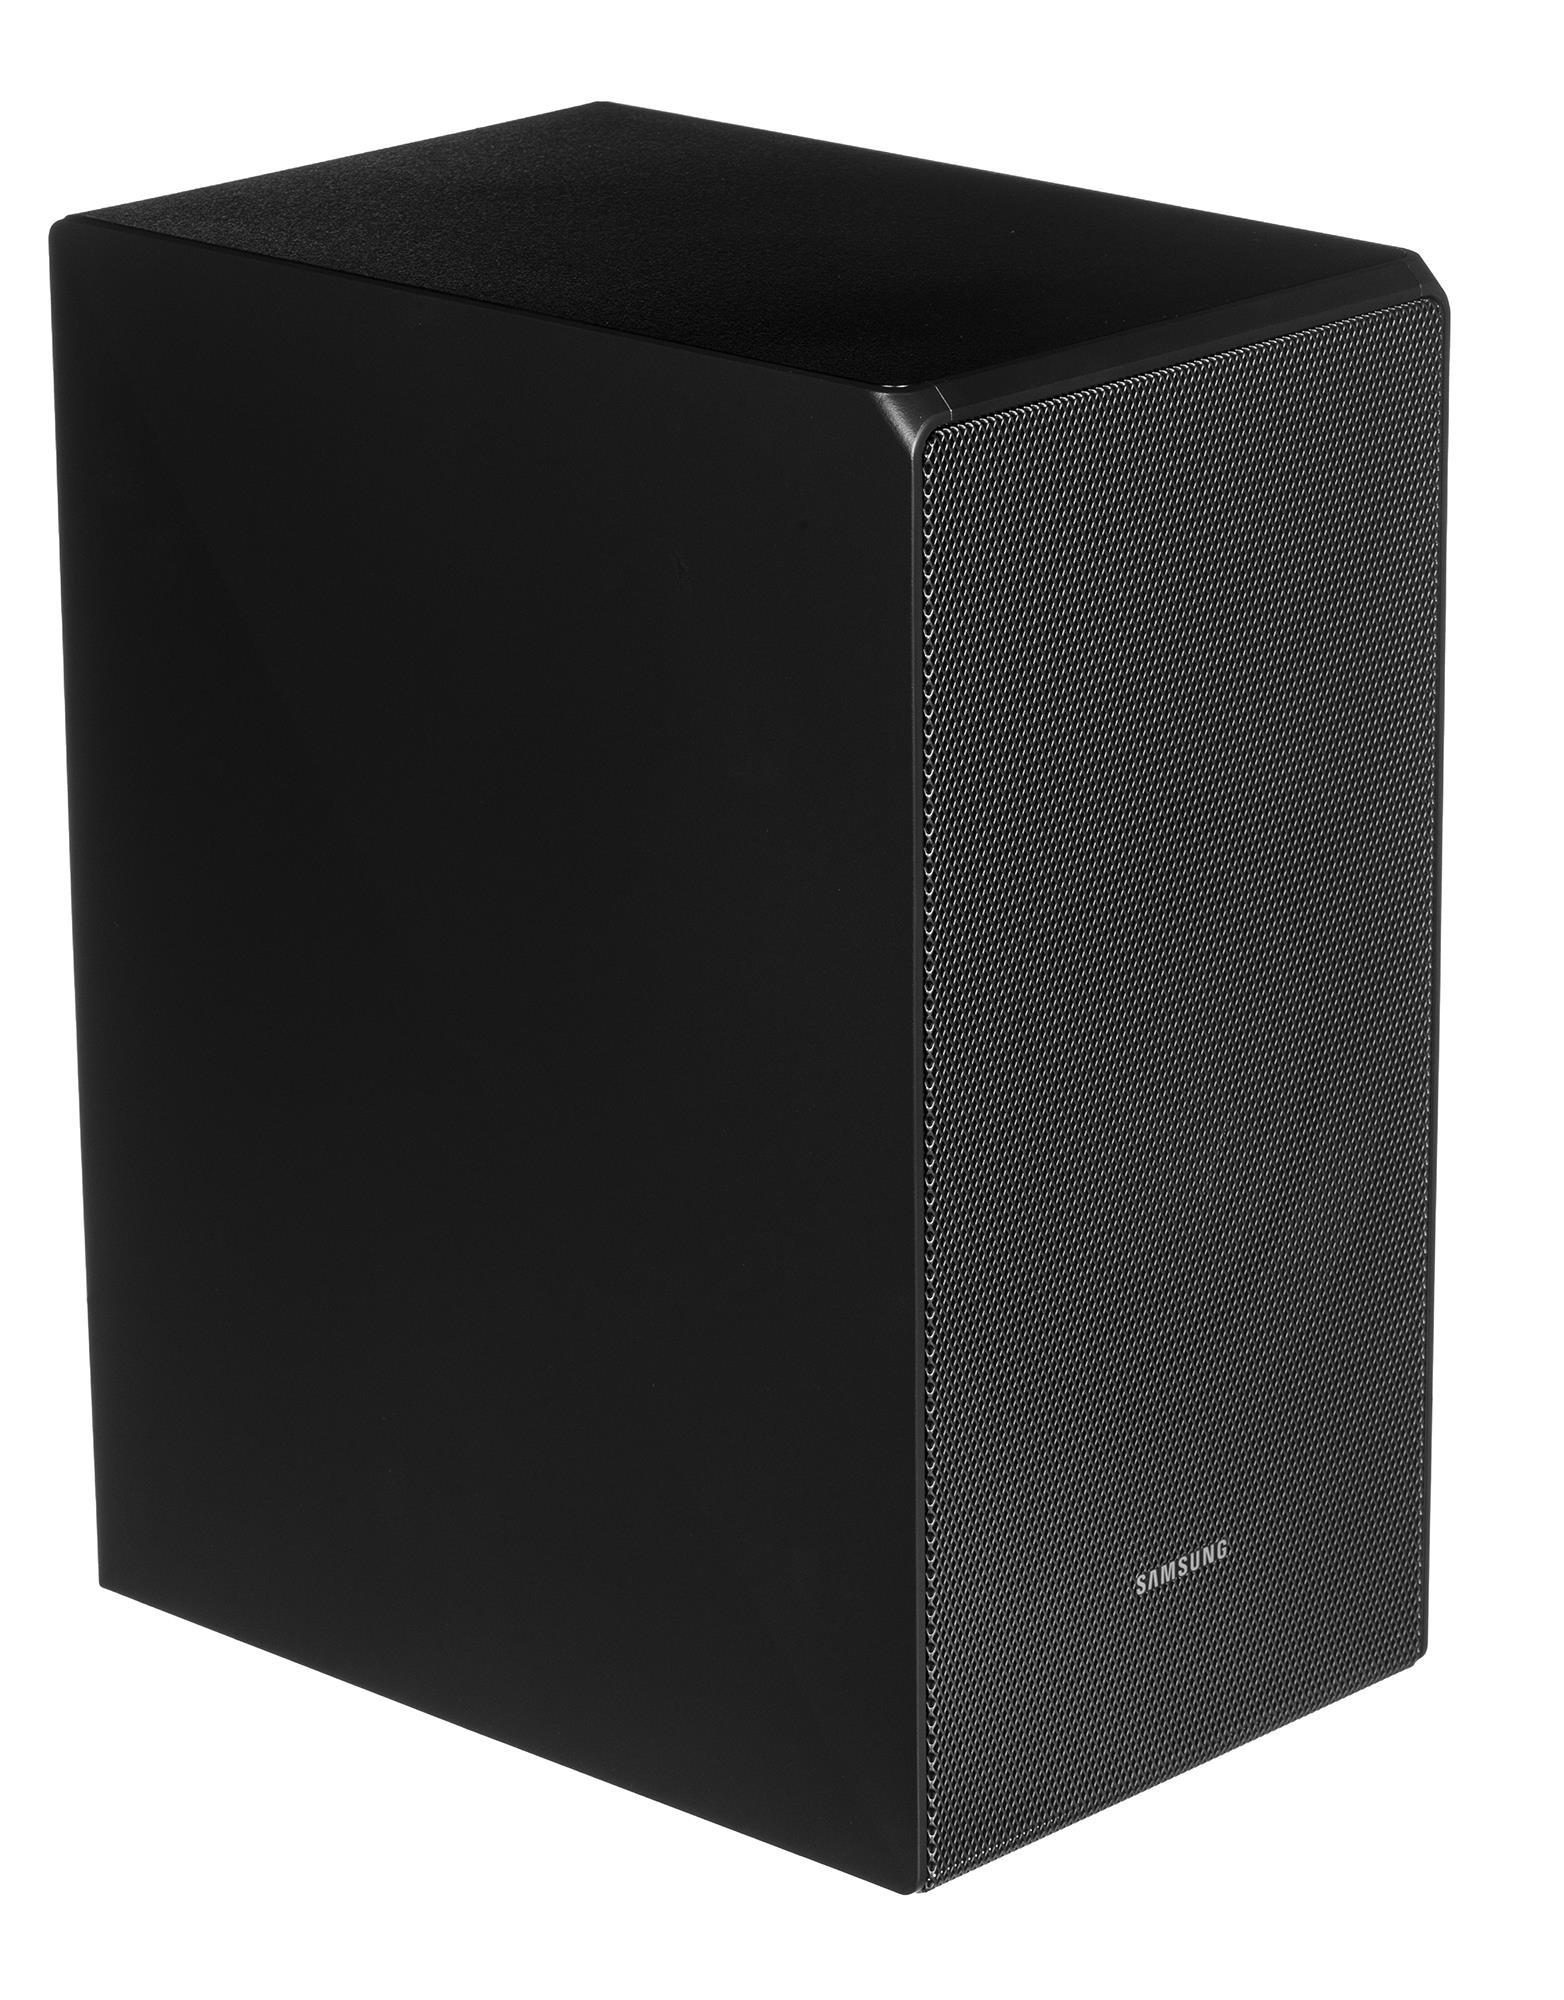 SAMSUNG HW-N650/NE Soundbar mājas kinozāle